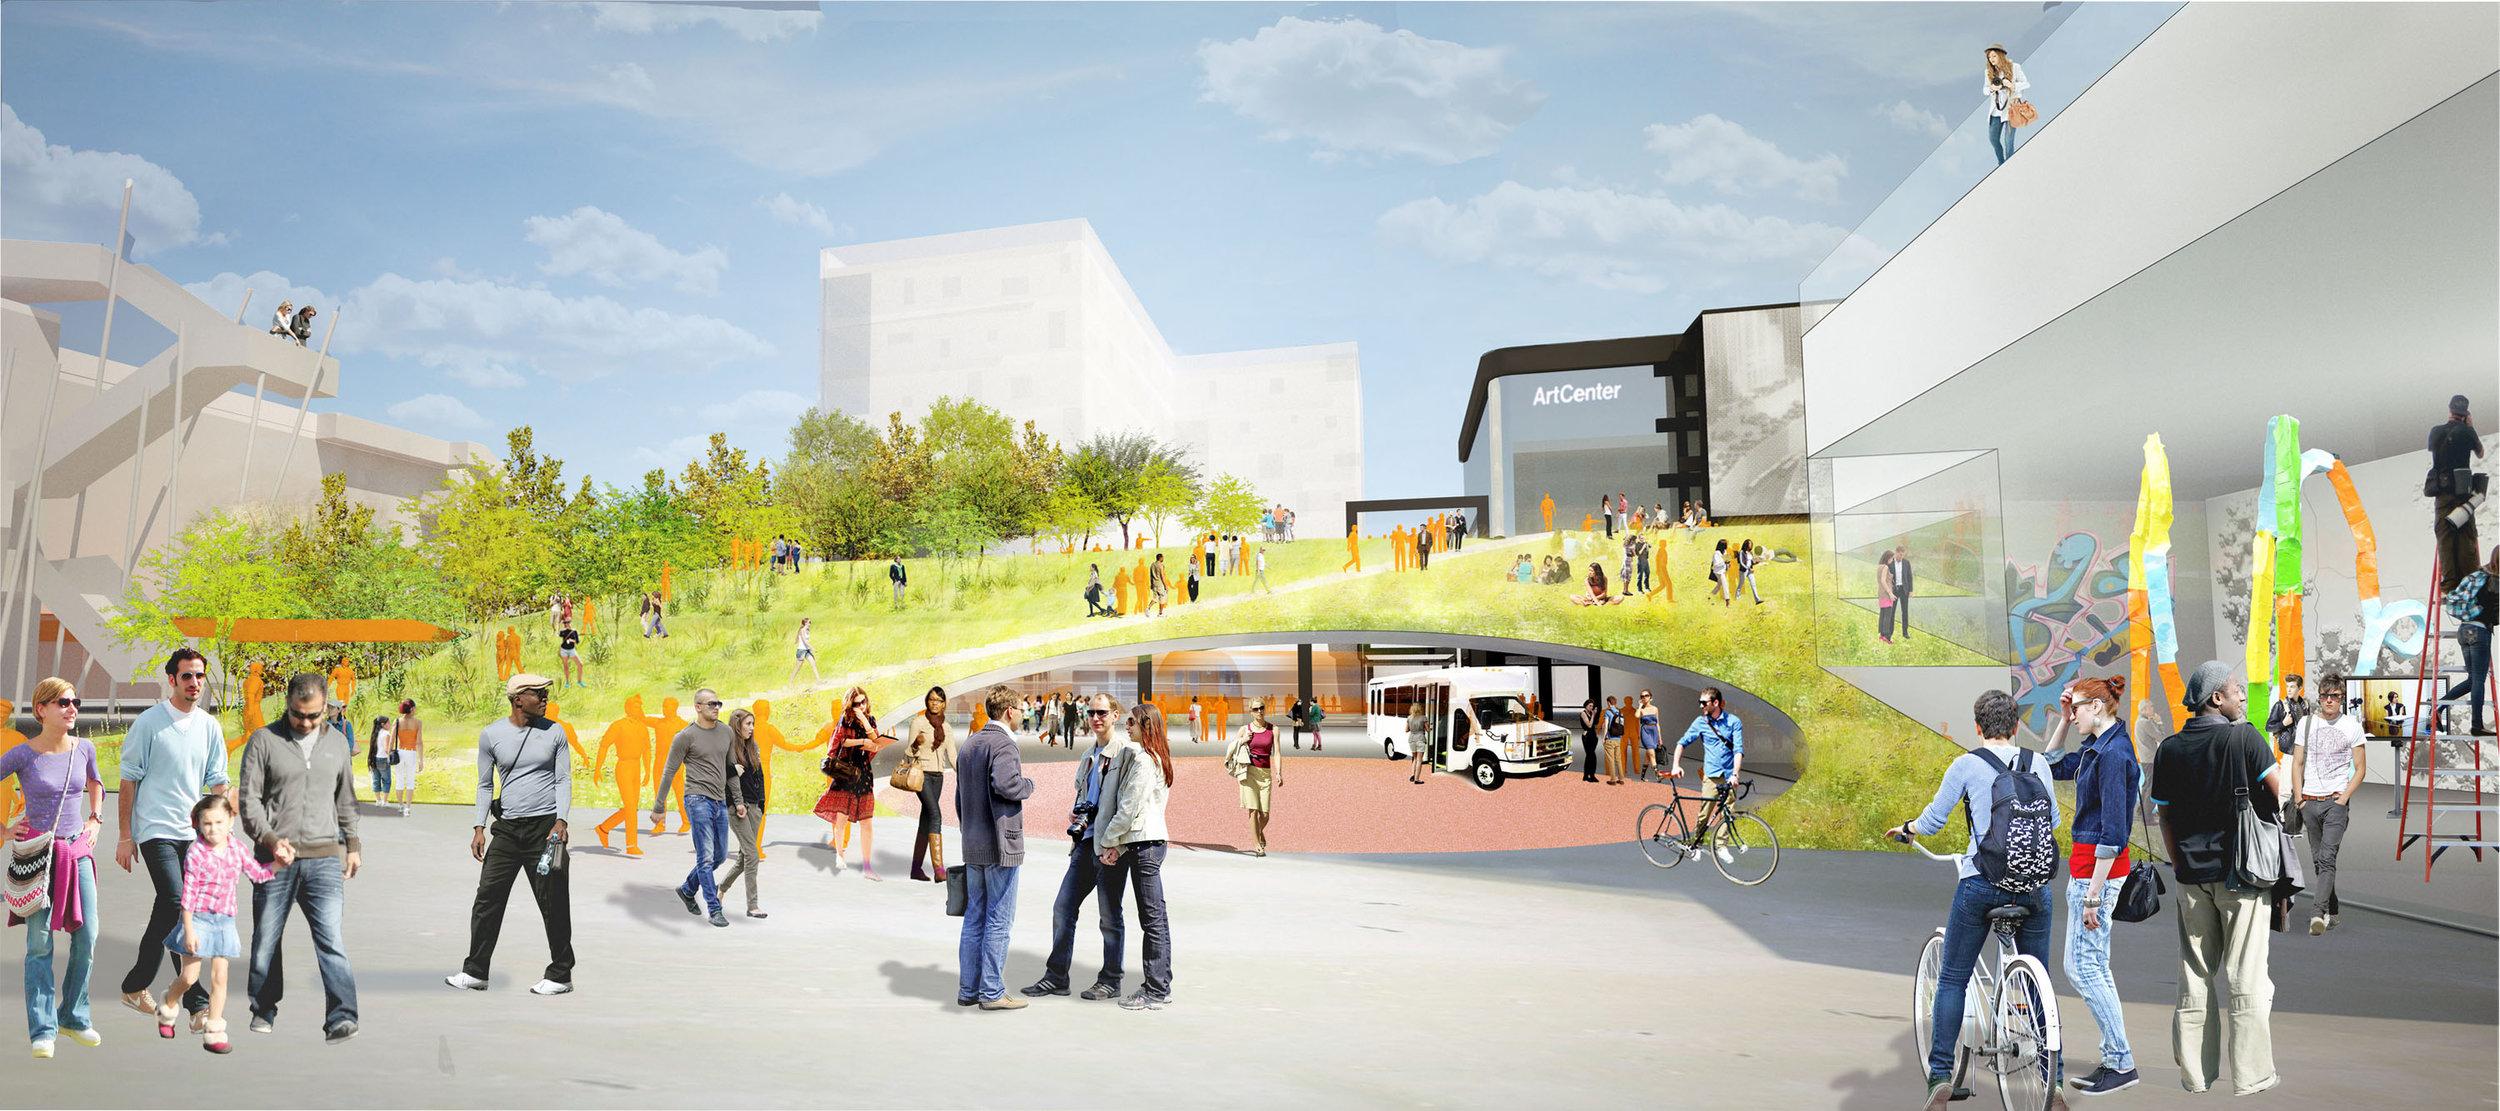 TINA CHEE landscape studio_ArtCenter College of Design Masterplan_mobility hub.jpg